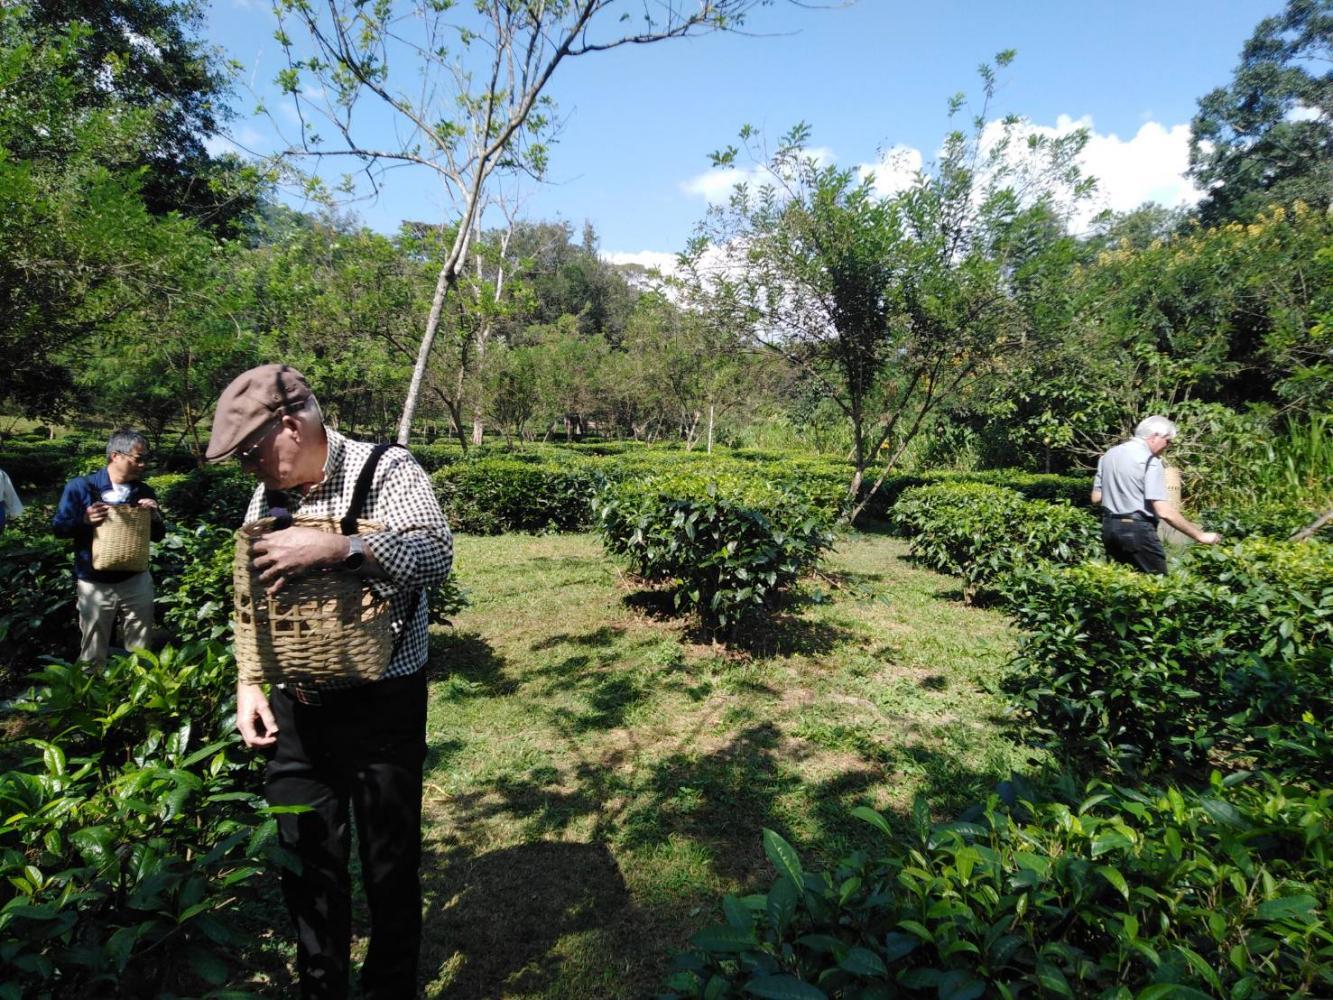 Tourists enjoy picking tea leaves at Araksa Tea Garden, a plantation in Chiang Mai.(Photo by Dusida Worrachaddejchai)